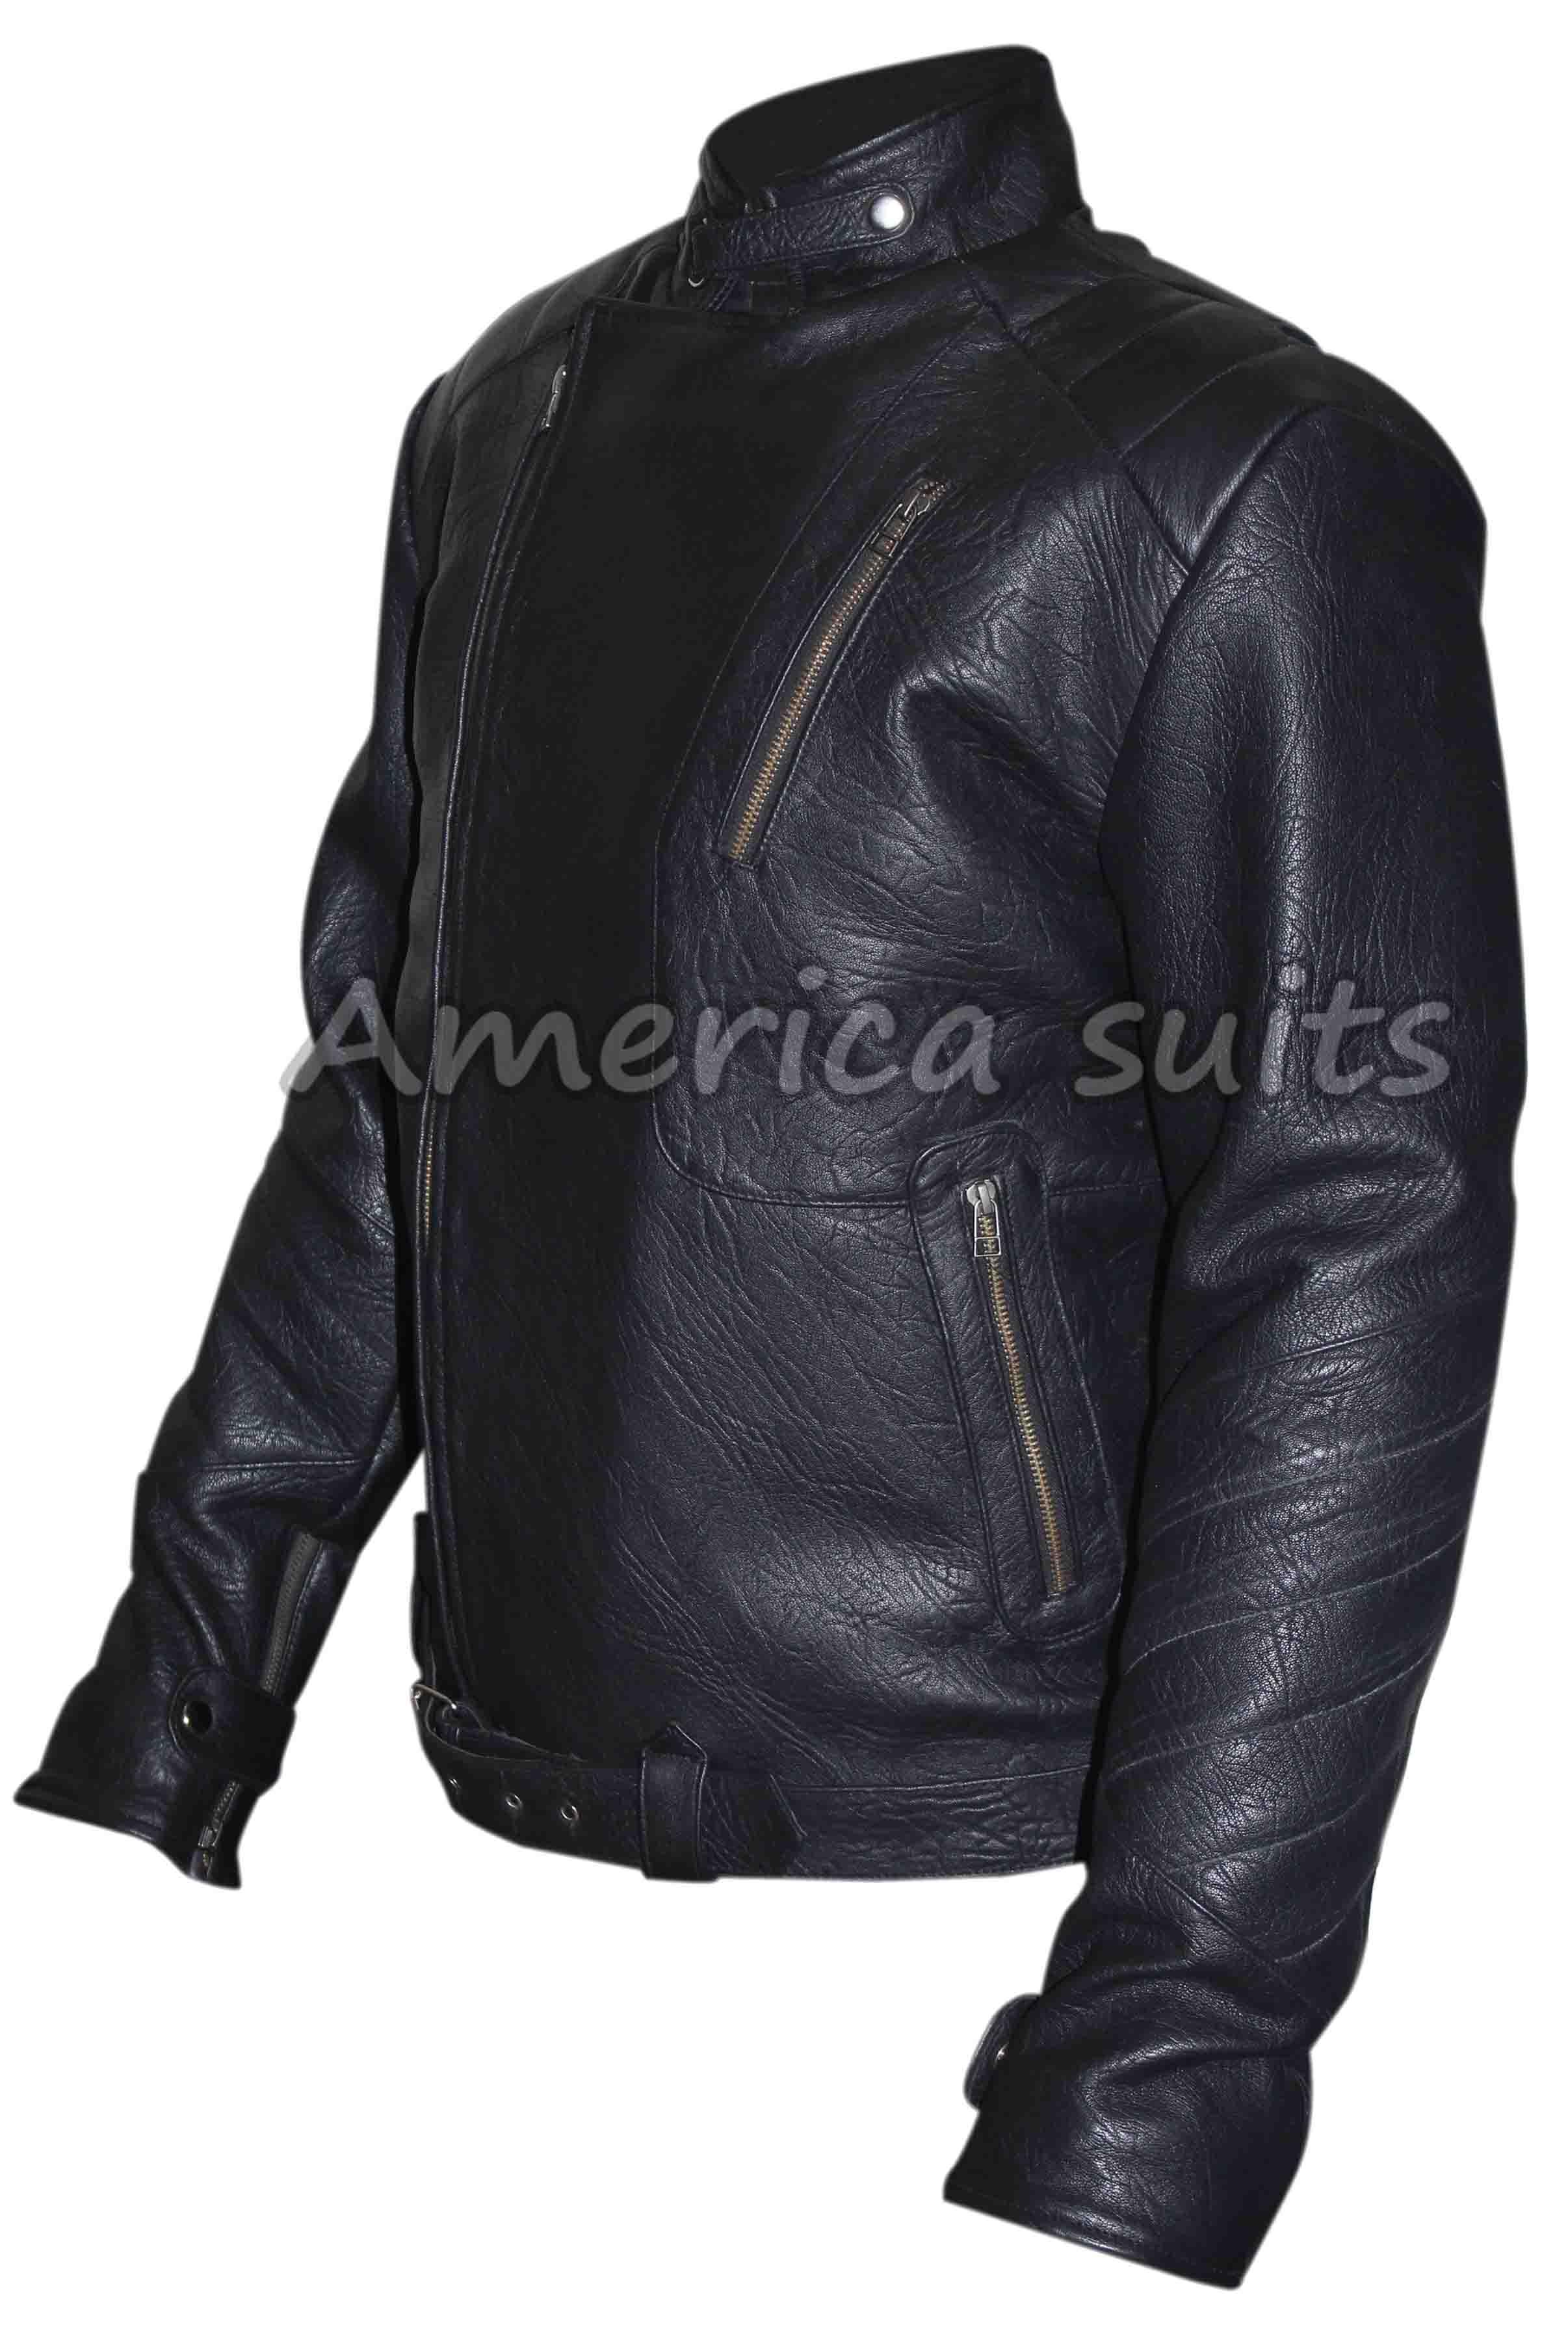 david-beckham-black-leather-jacket-650x650.JPG